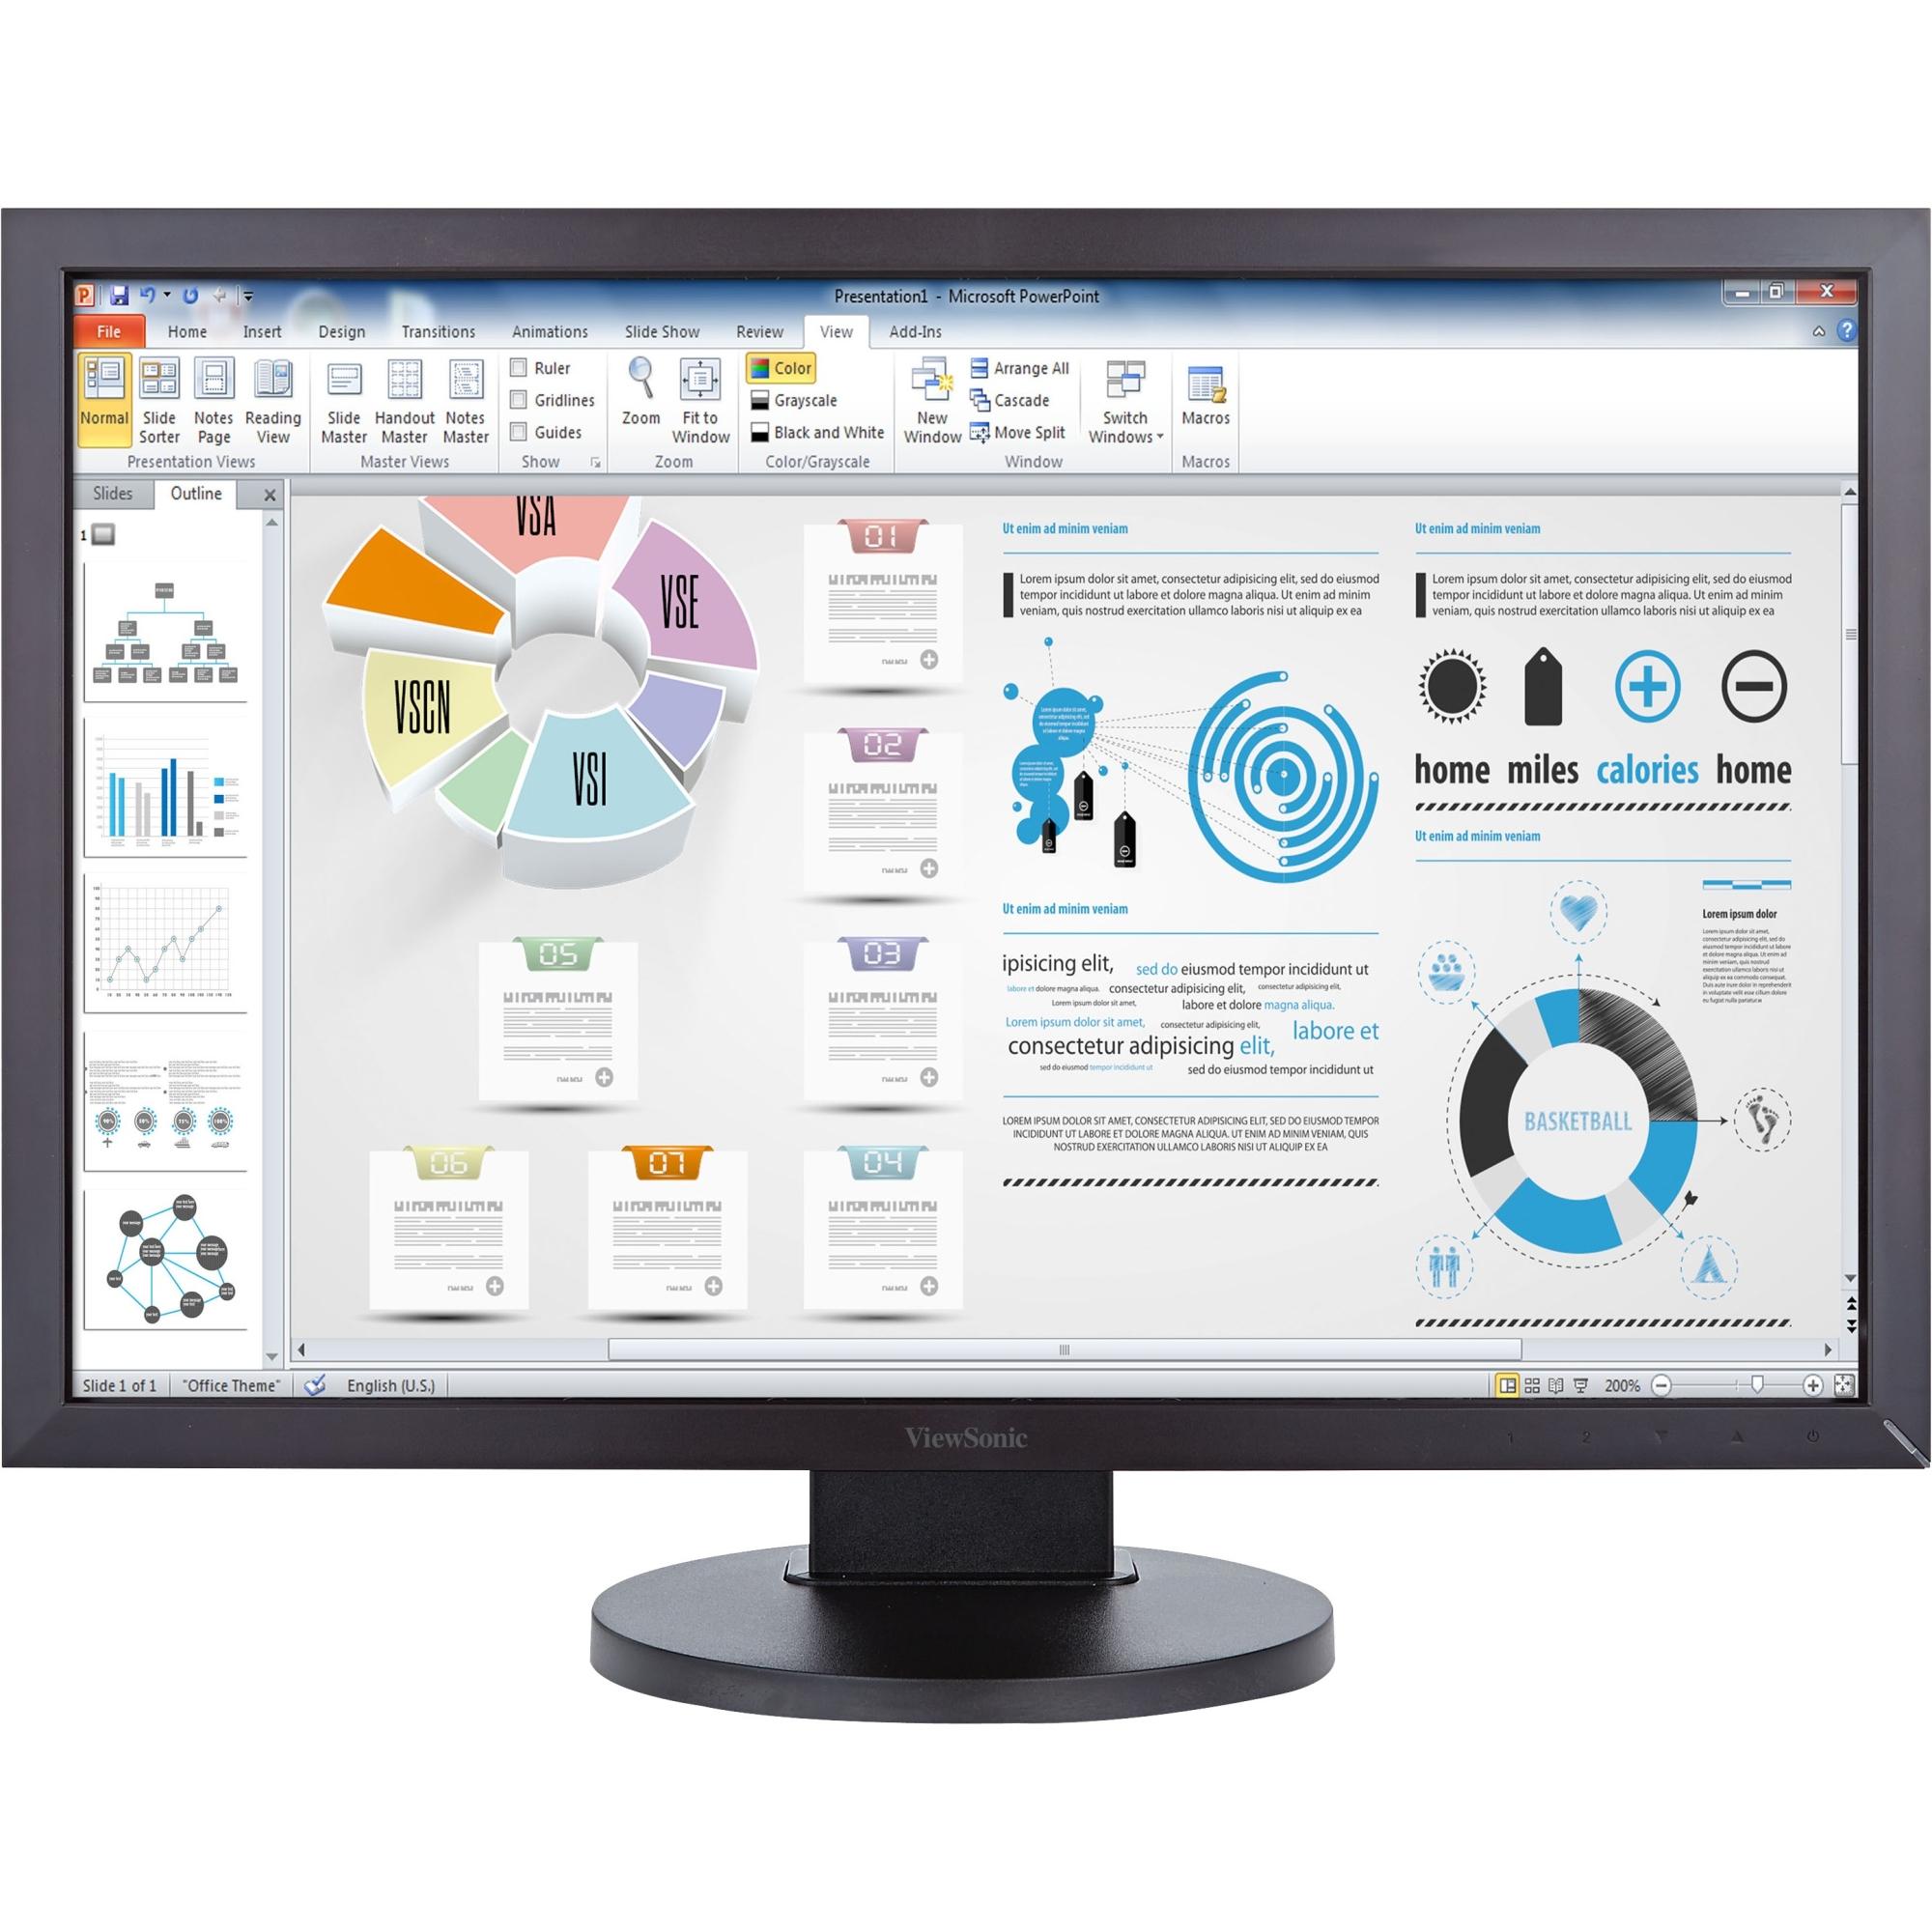 24 inch LED LCD Monitor - 16:10 - 5 ms - 1920 x 1200 - 16.7 Million Colors - 250 Nit - 50000000:1 - WUXGA - Speakers - DVI - VGA - DisplayPort - USB - 30 W - Black - TCO Certified Displays